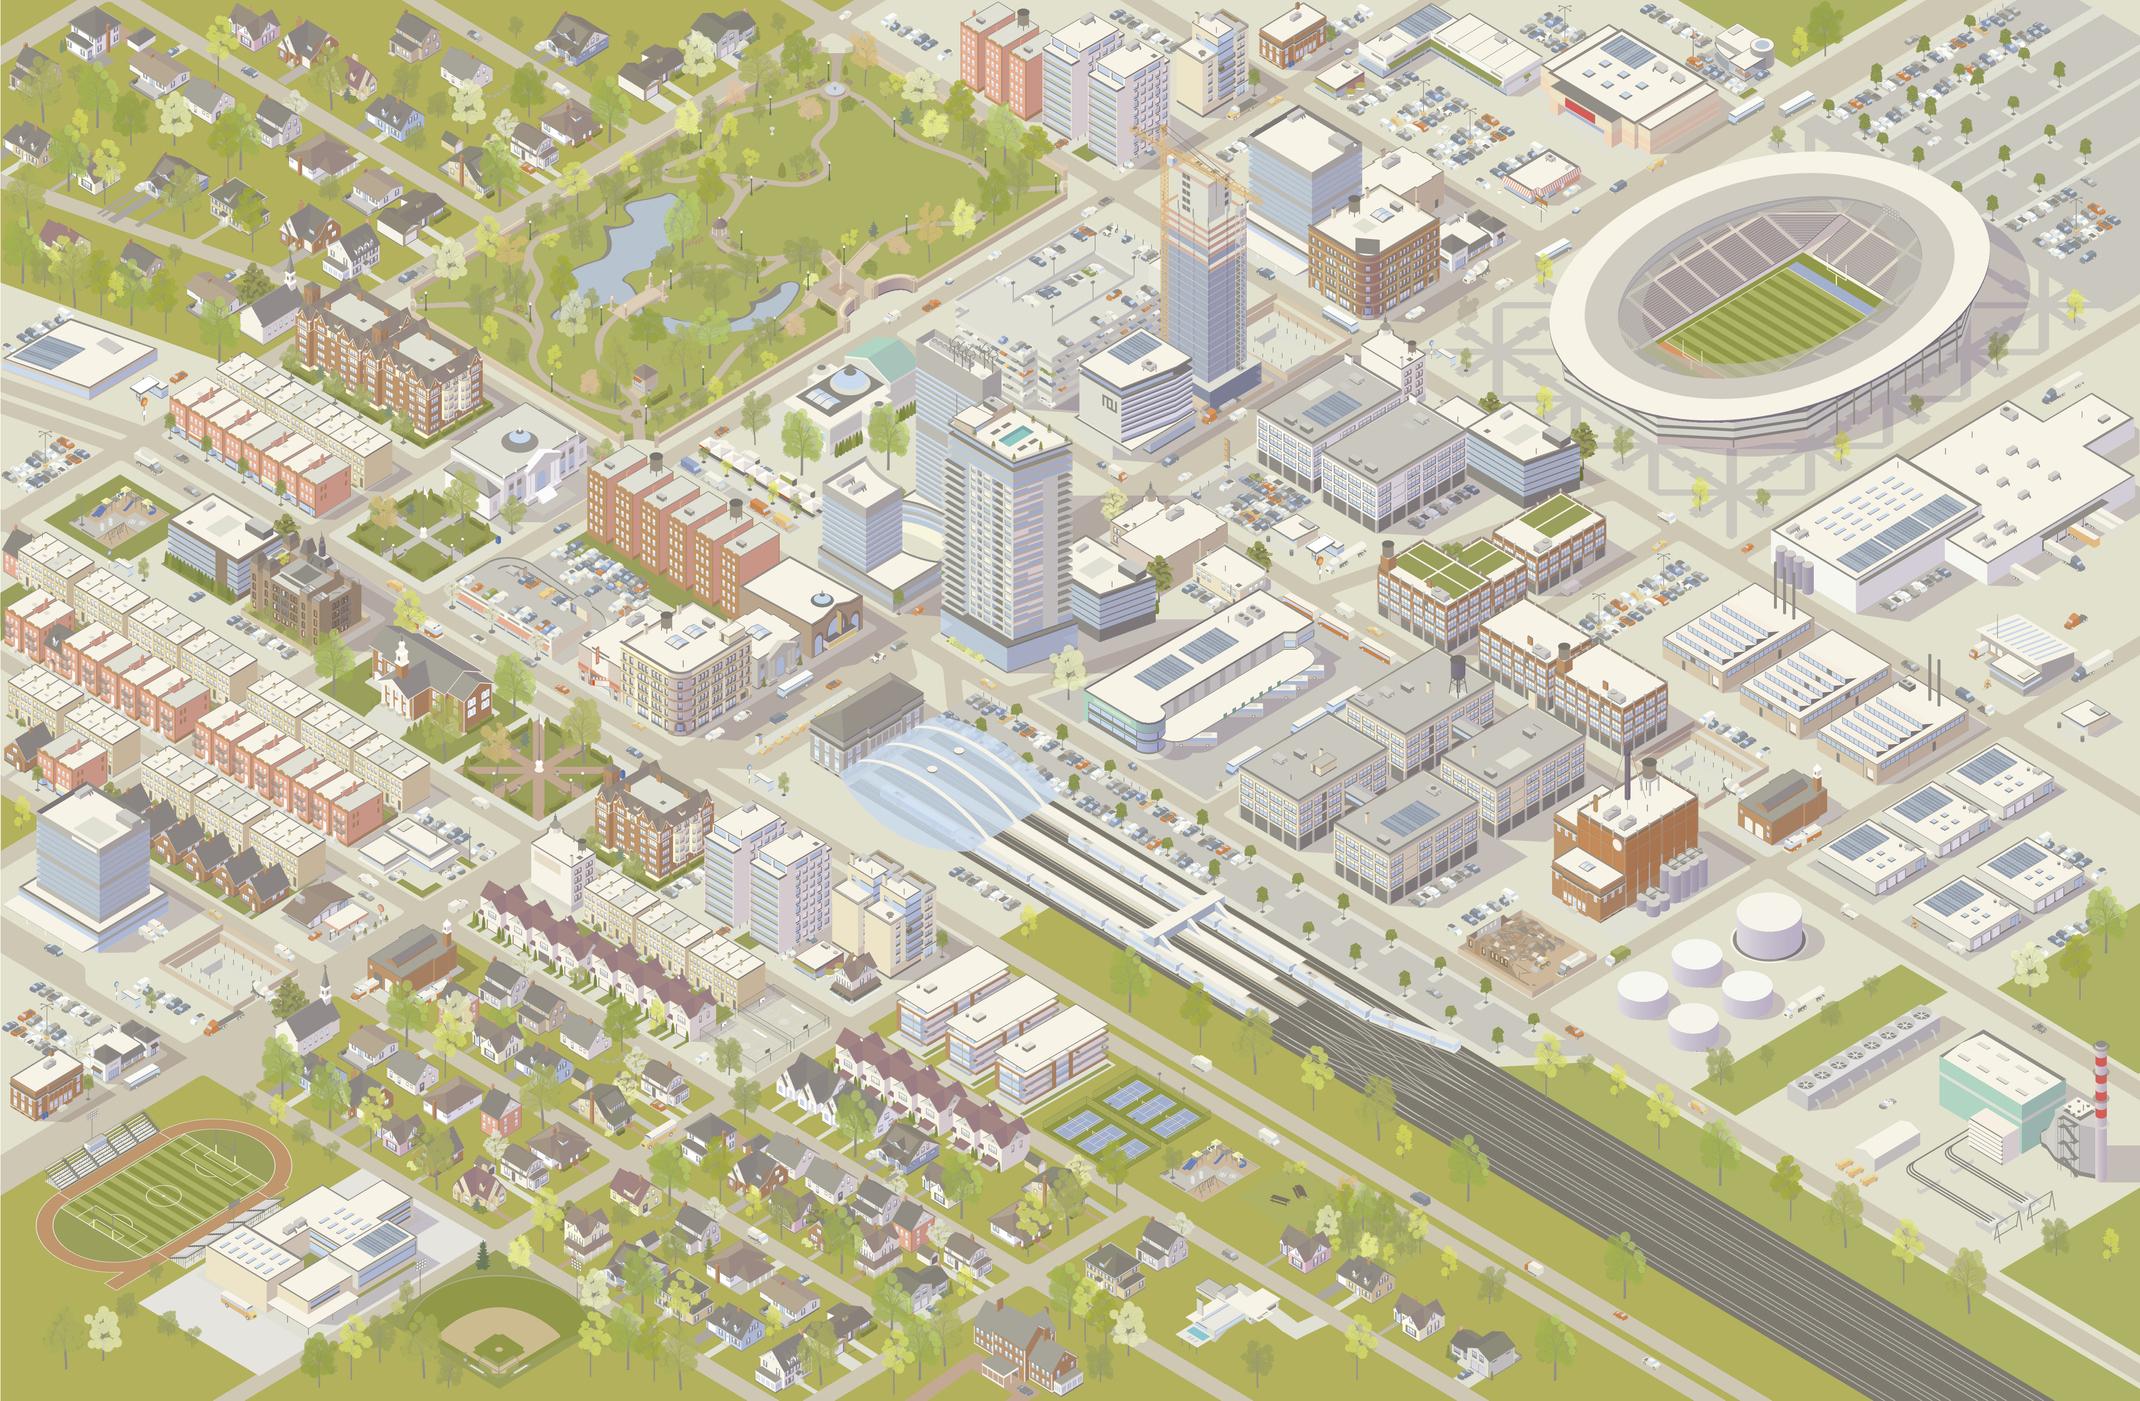 Bird's eye view illustration of a city